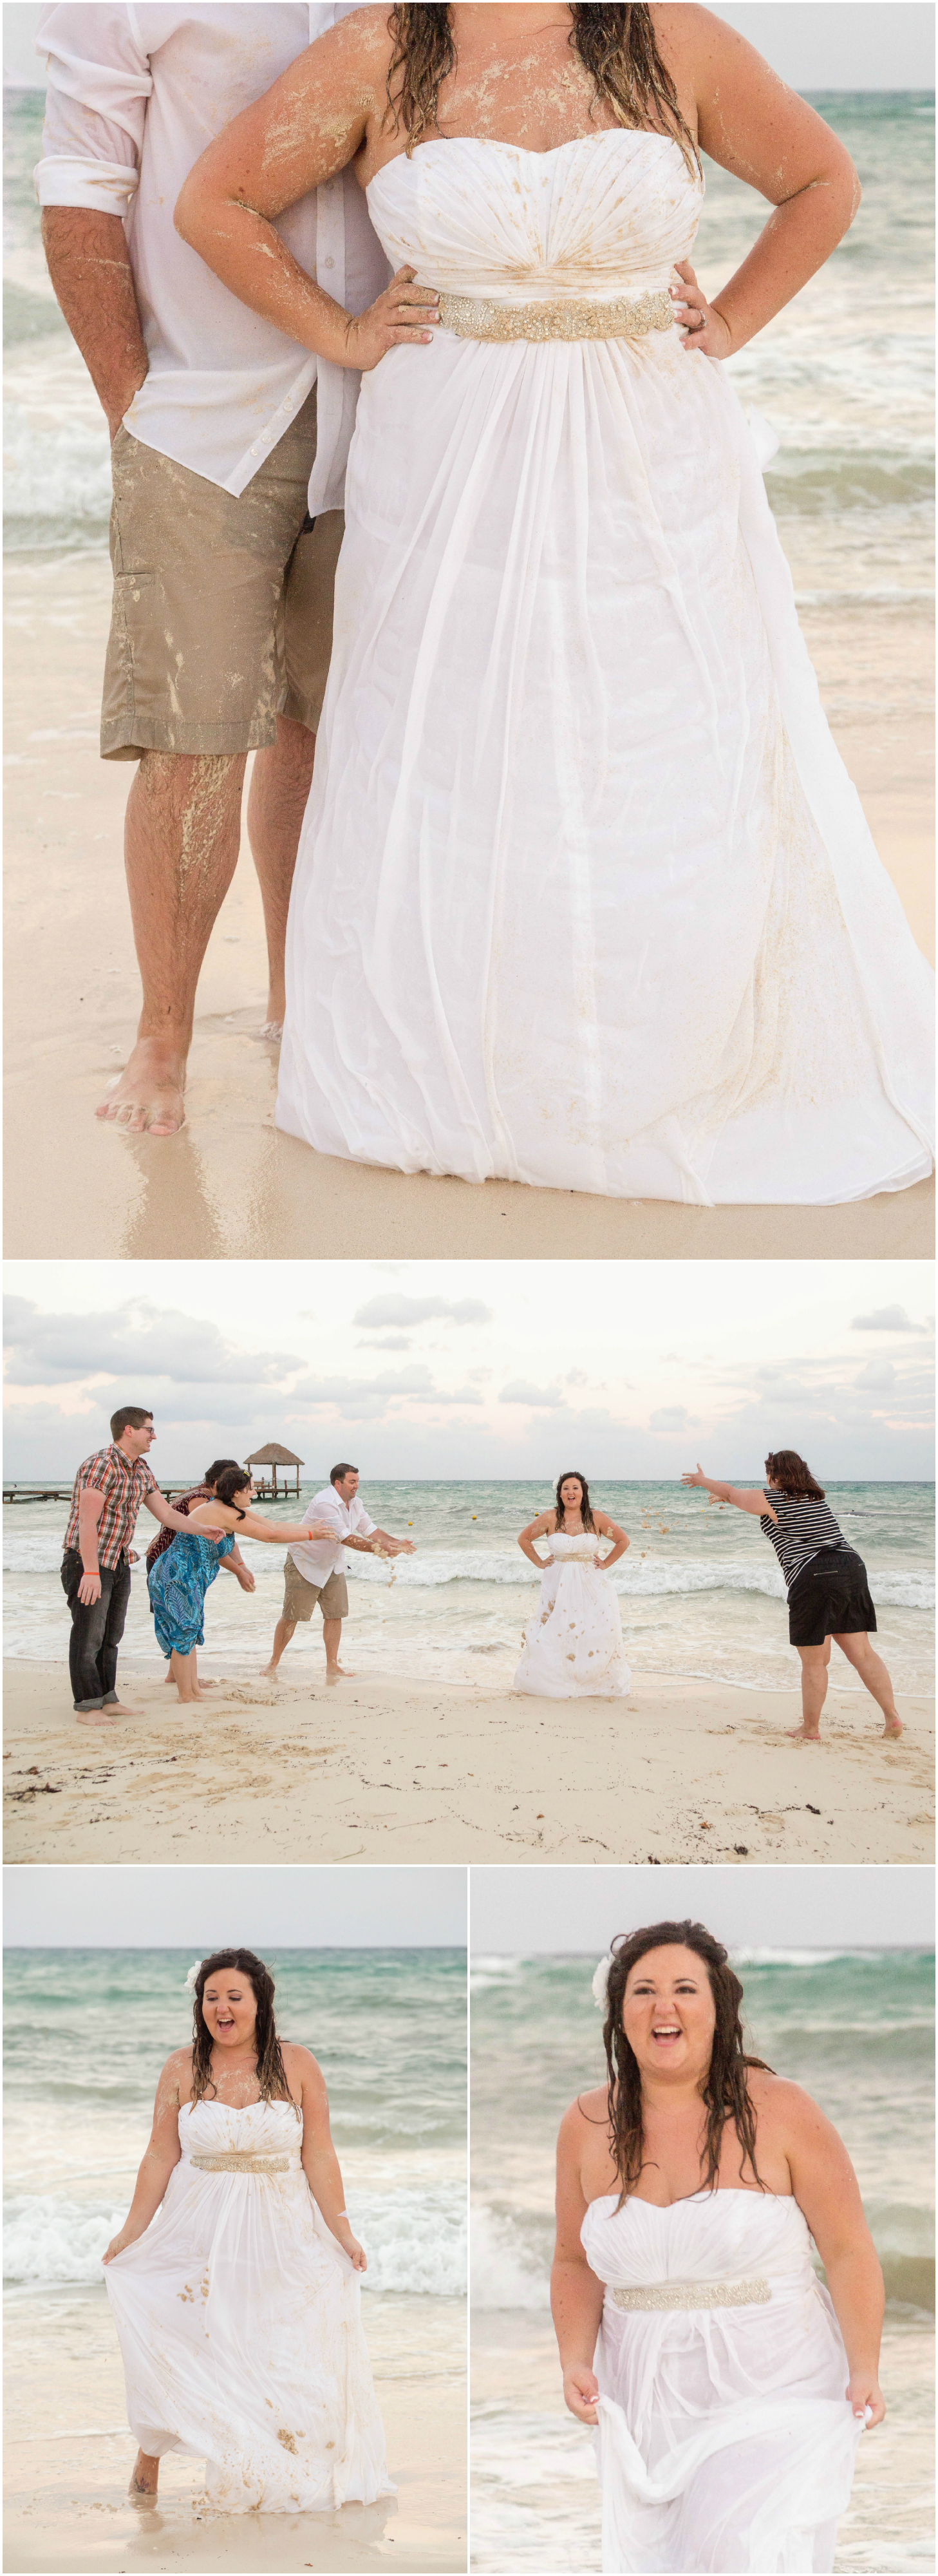 riviera-maya-wedding-ttd_10.png